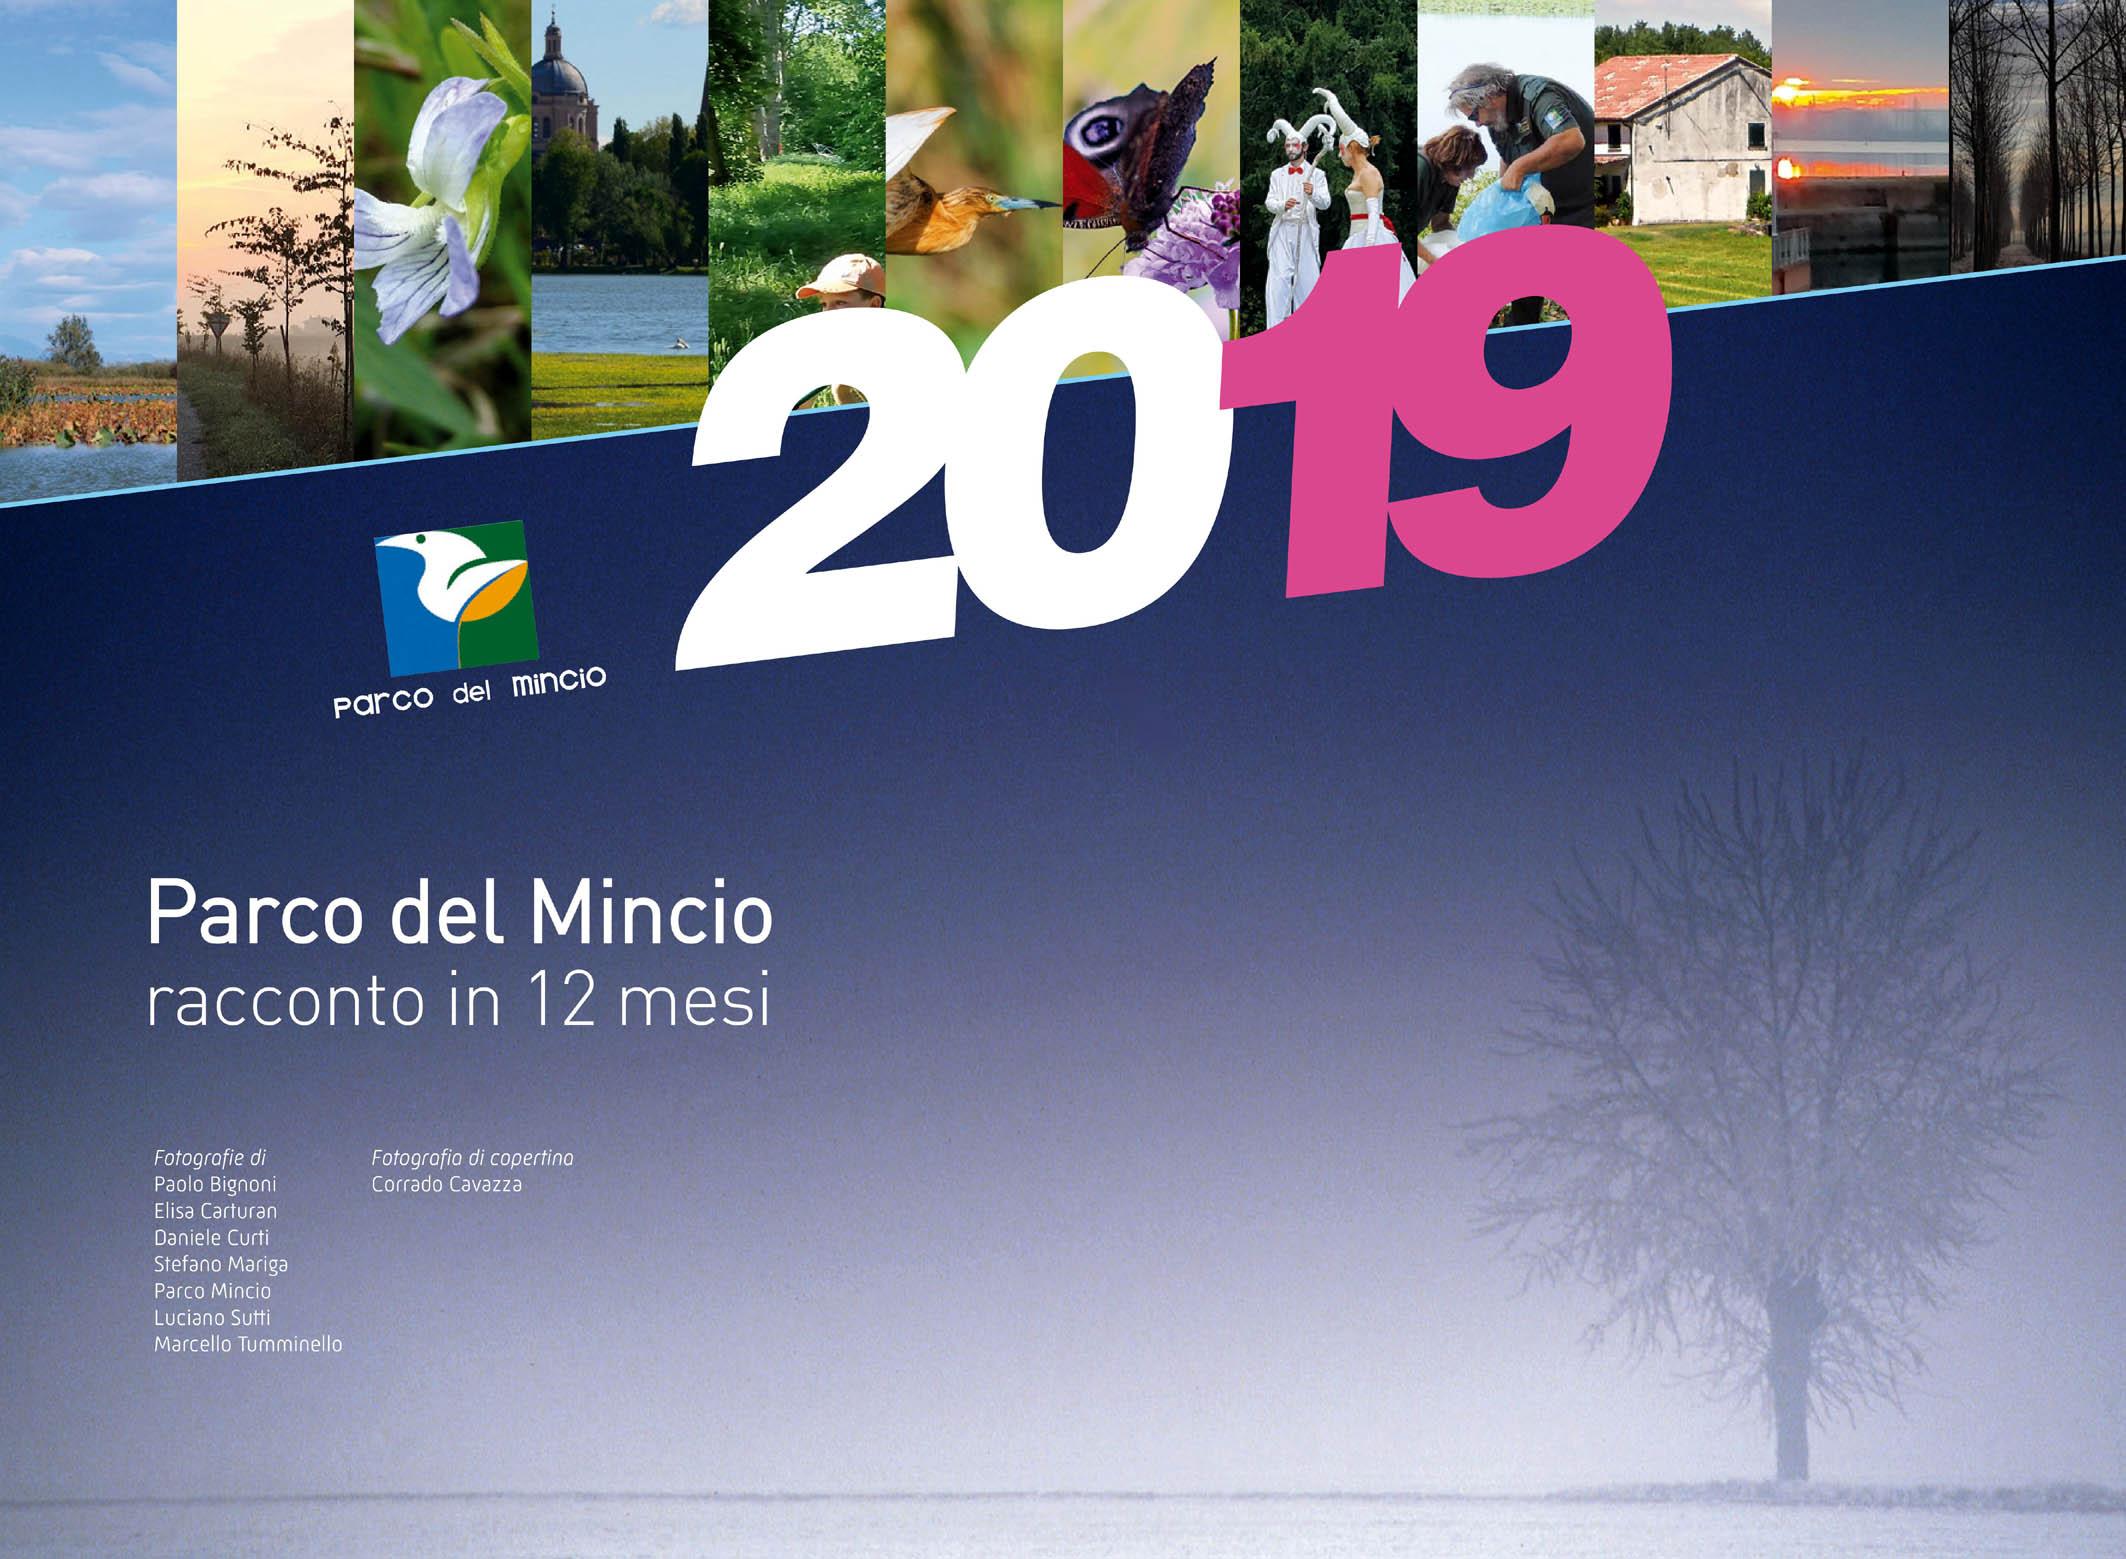 Calendario 12 Mesi.Parco Del Mincio Presentato Il Calendario 2019 Racconto In